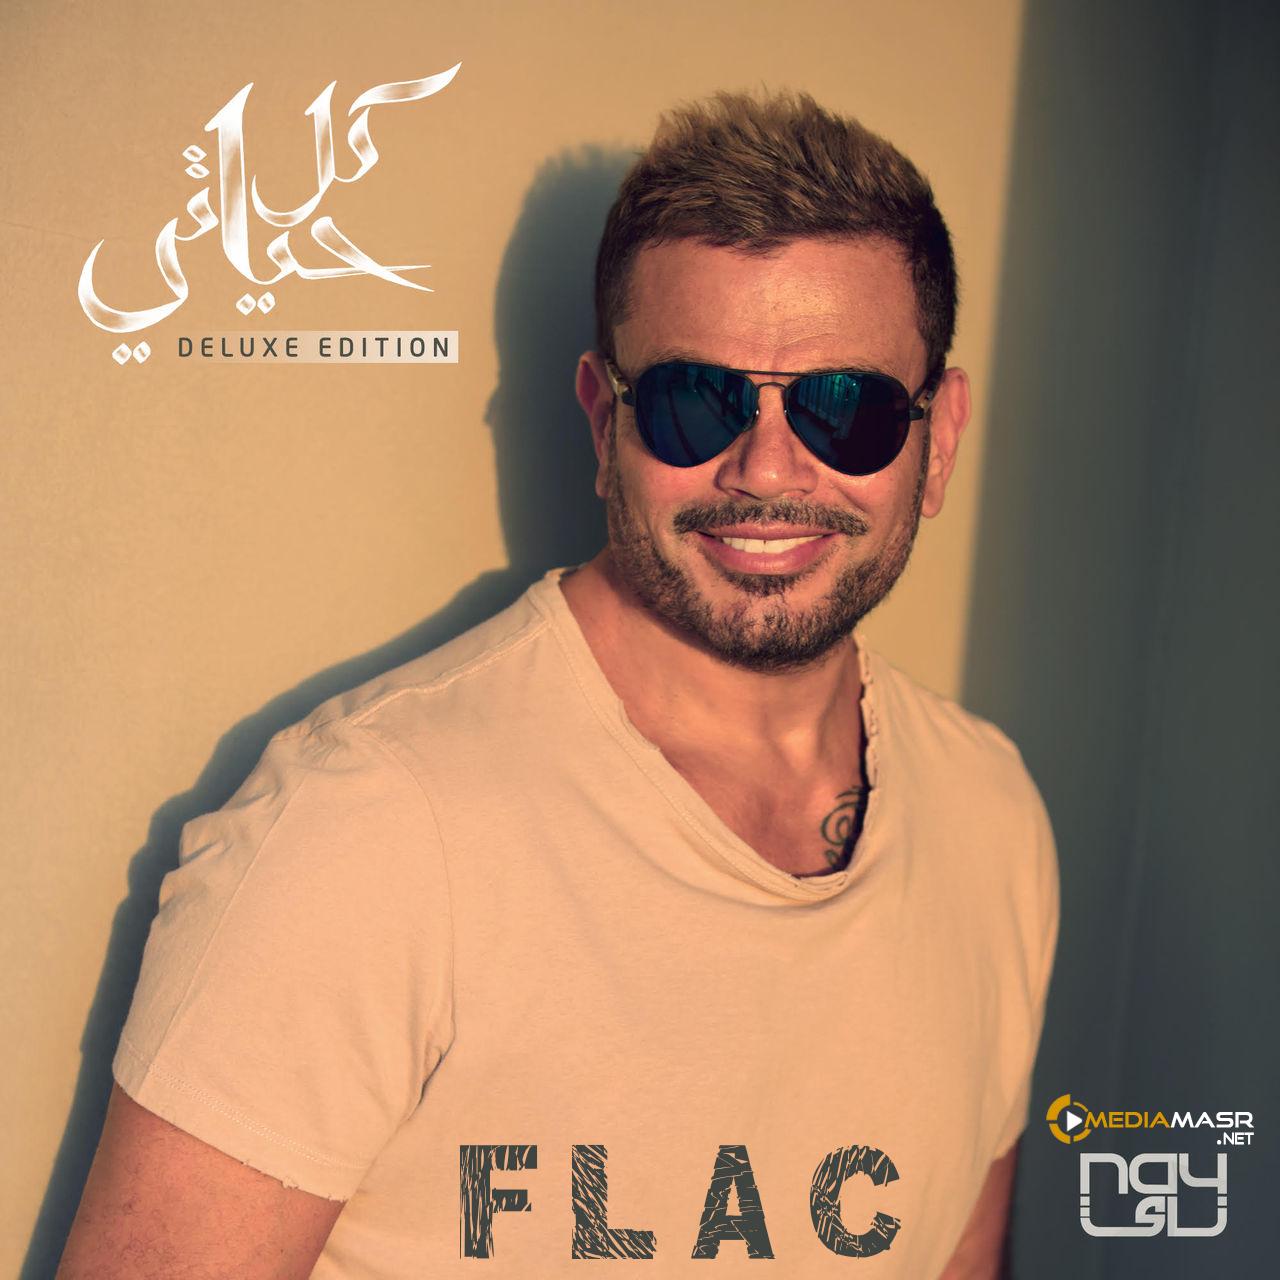 استماع وتحميل البوم عمرو دياب - كل حياتي 2018 -FLAC - برابط مباشر